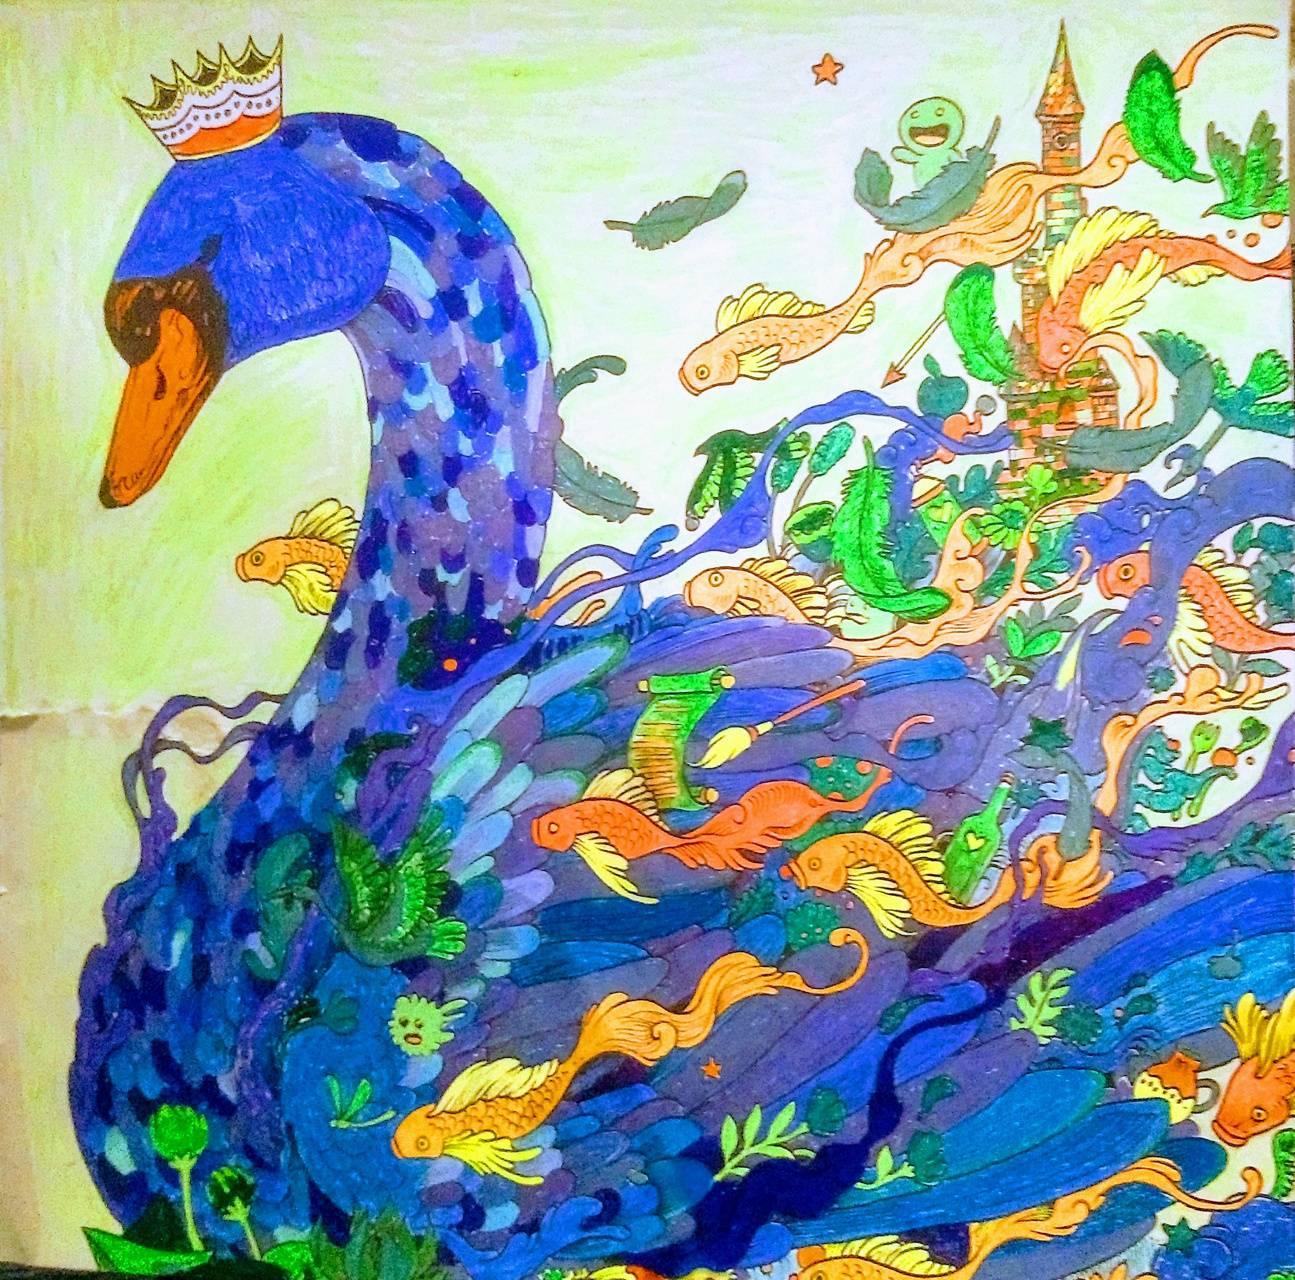 Swan gel penned